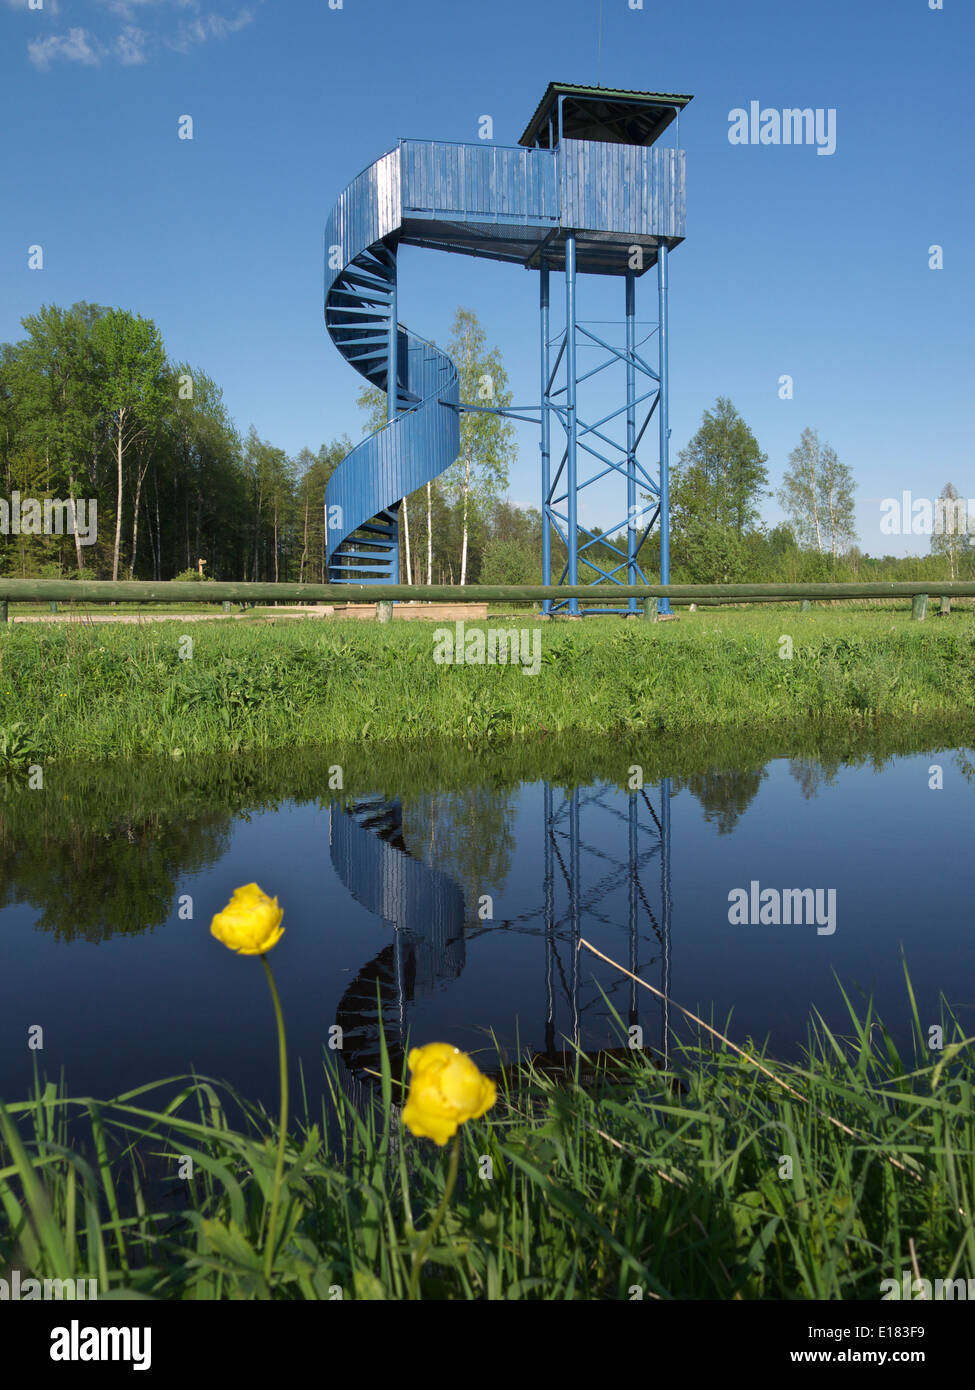 L tti watchtower in soomaa national park estonia viljandi county may 2014 stock